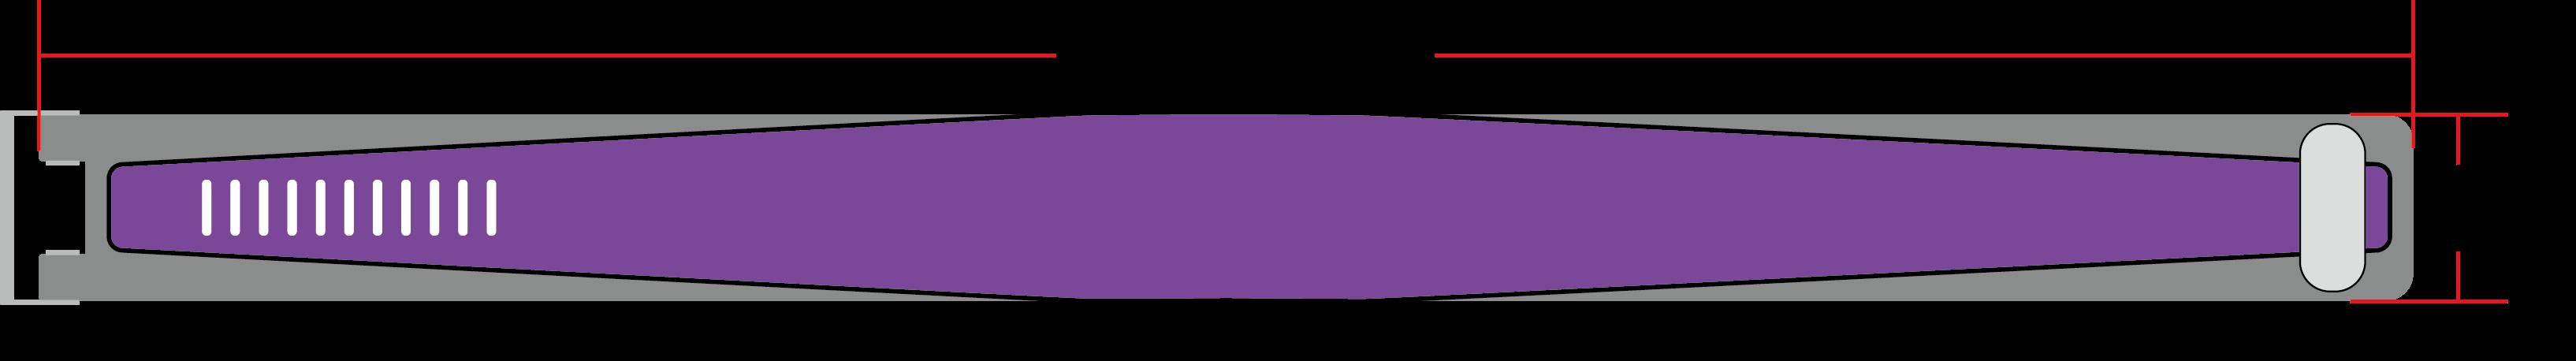 rfid wristband size